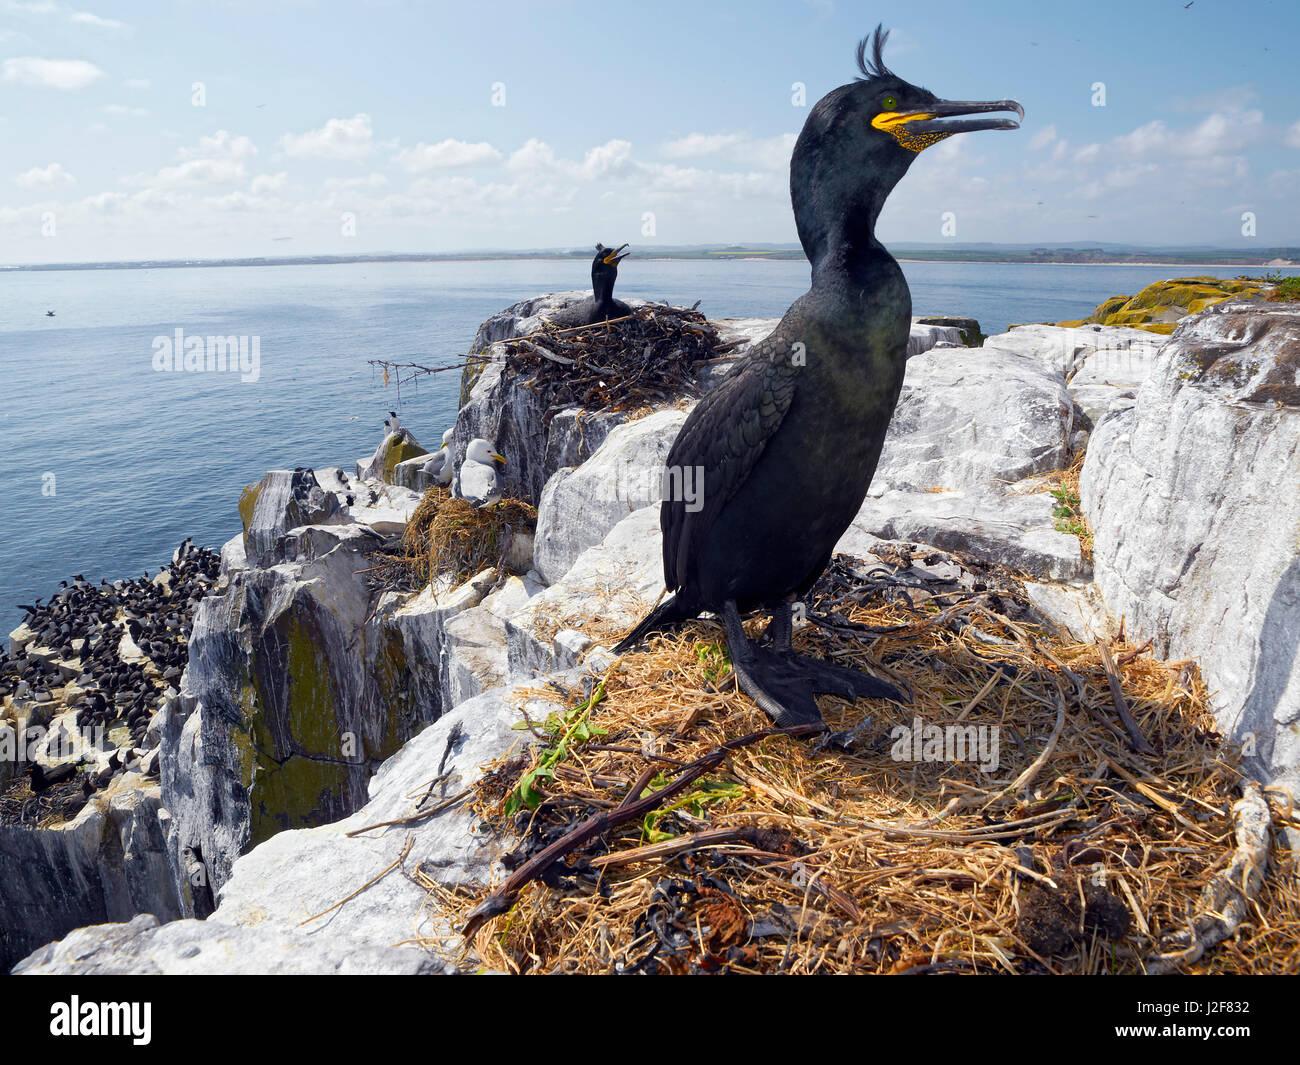 common shag, breeding. Phalacrocorax aristotelis, Farne Island, United Kingdom - Stock Image